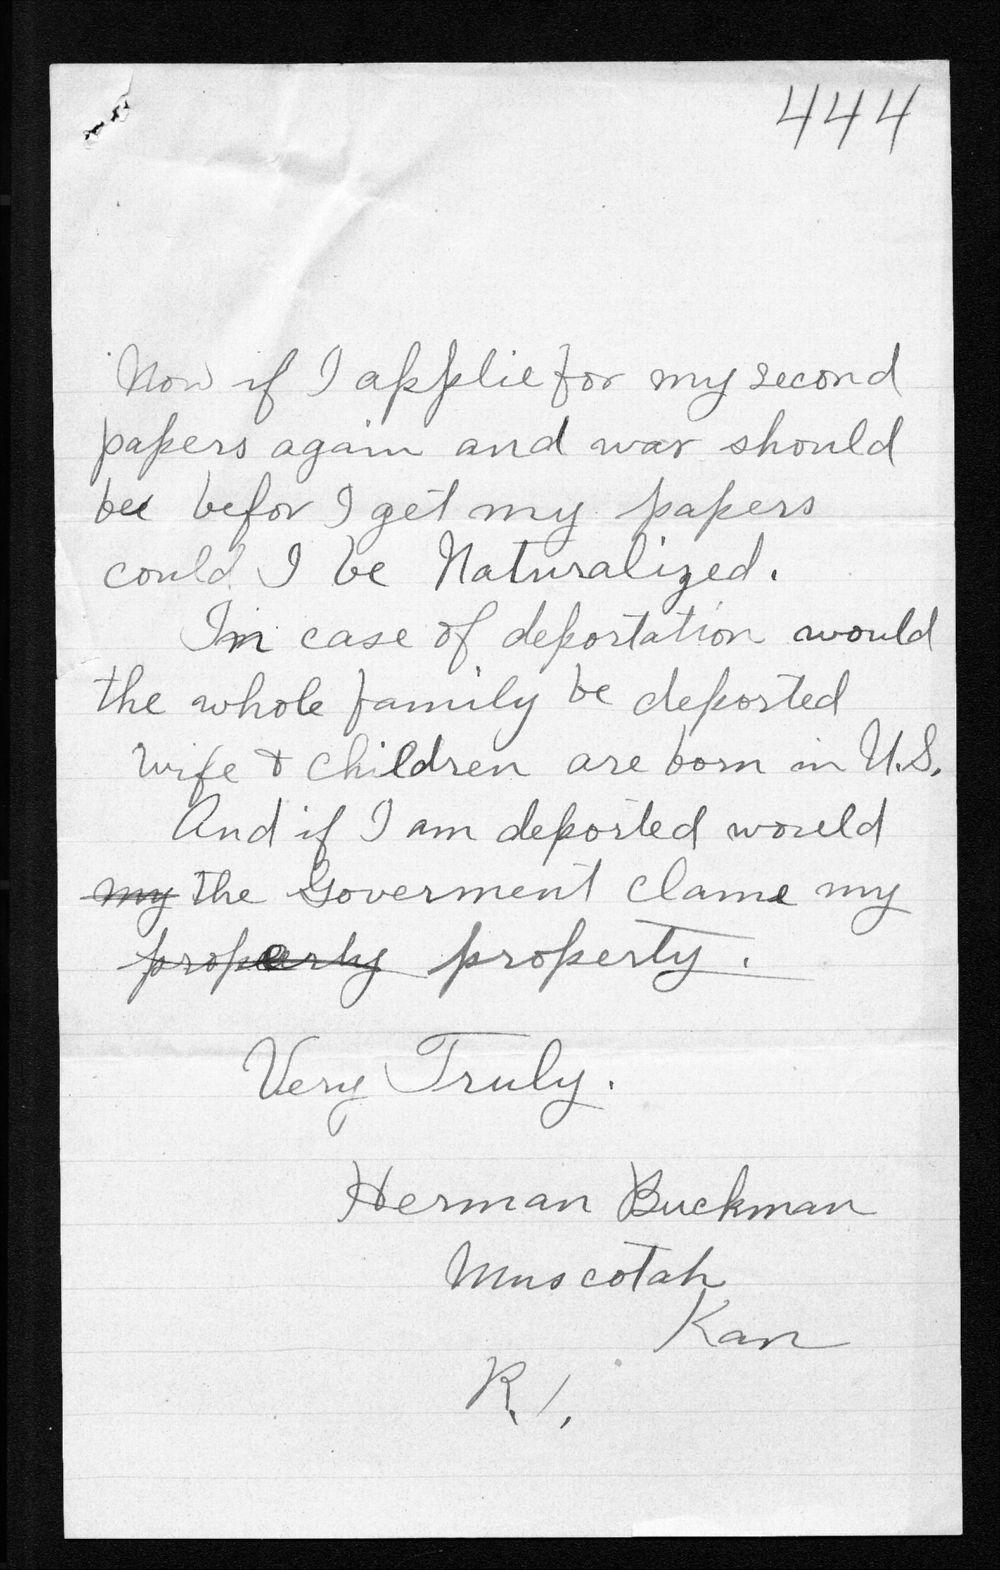 Herman Buckman to Arthur Capper - 2